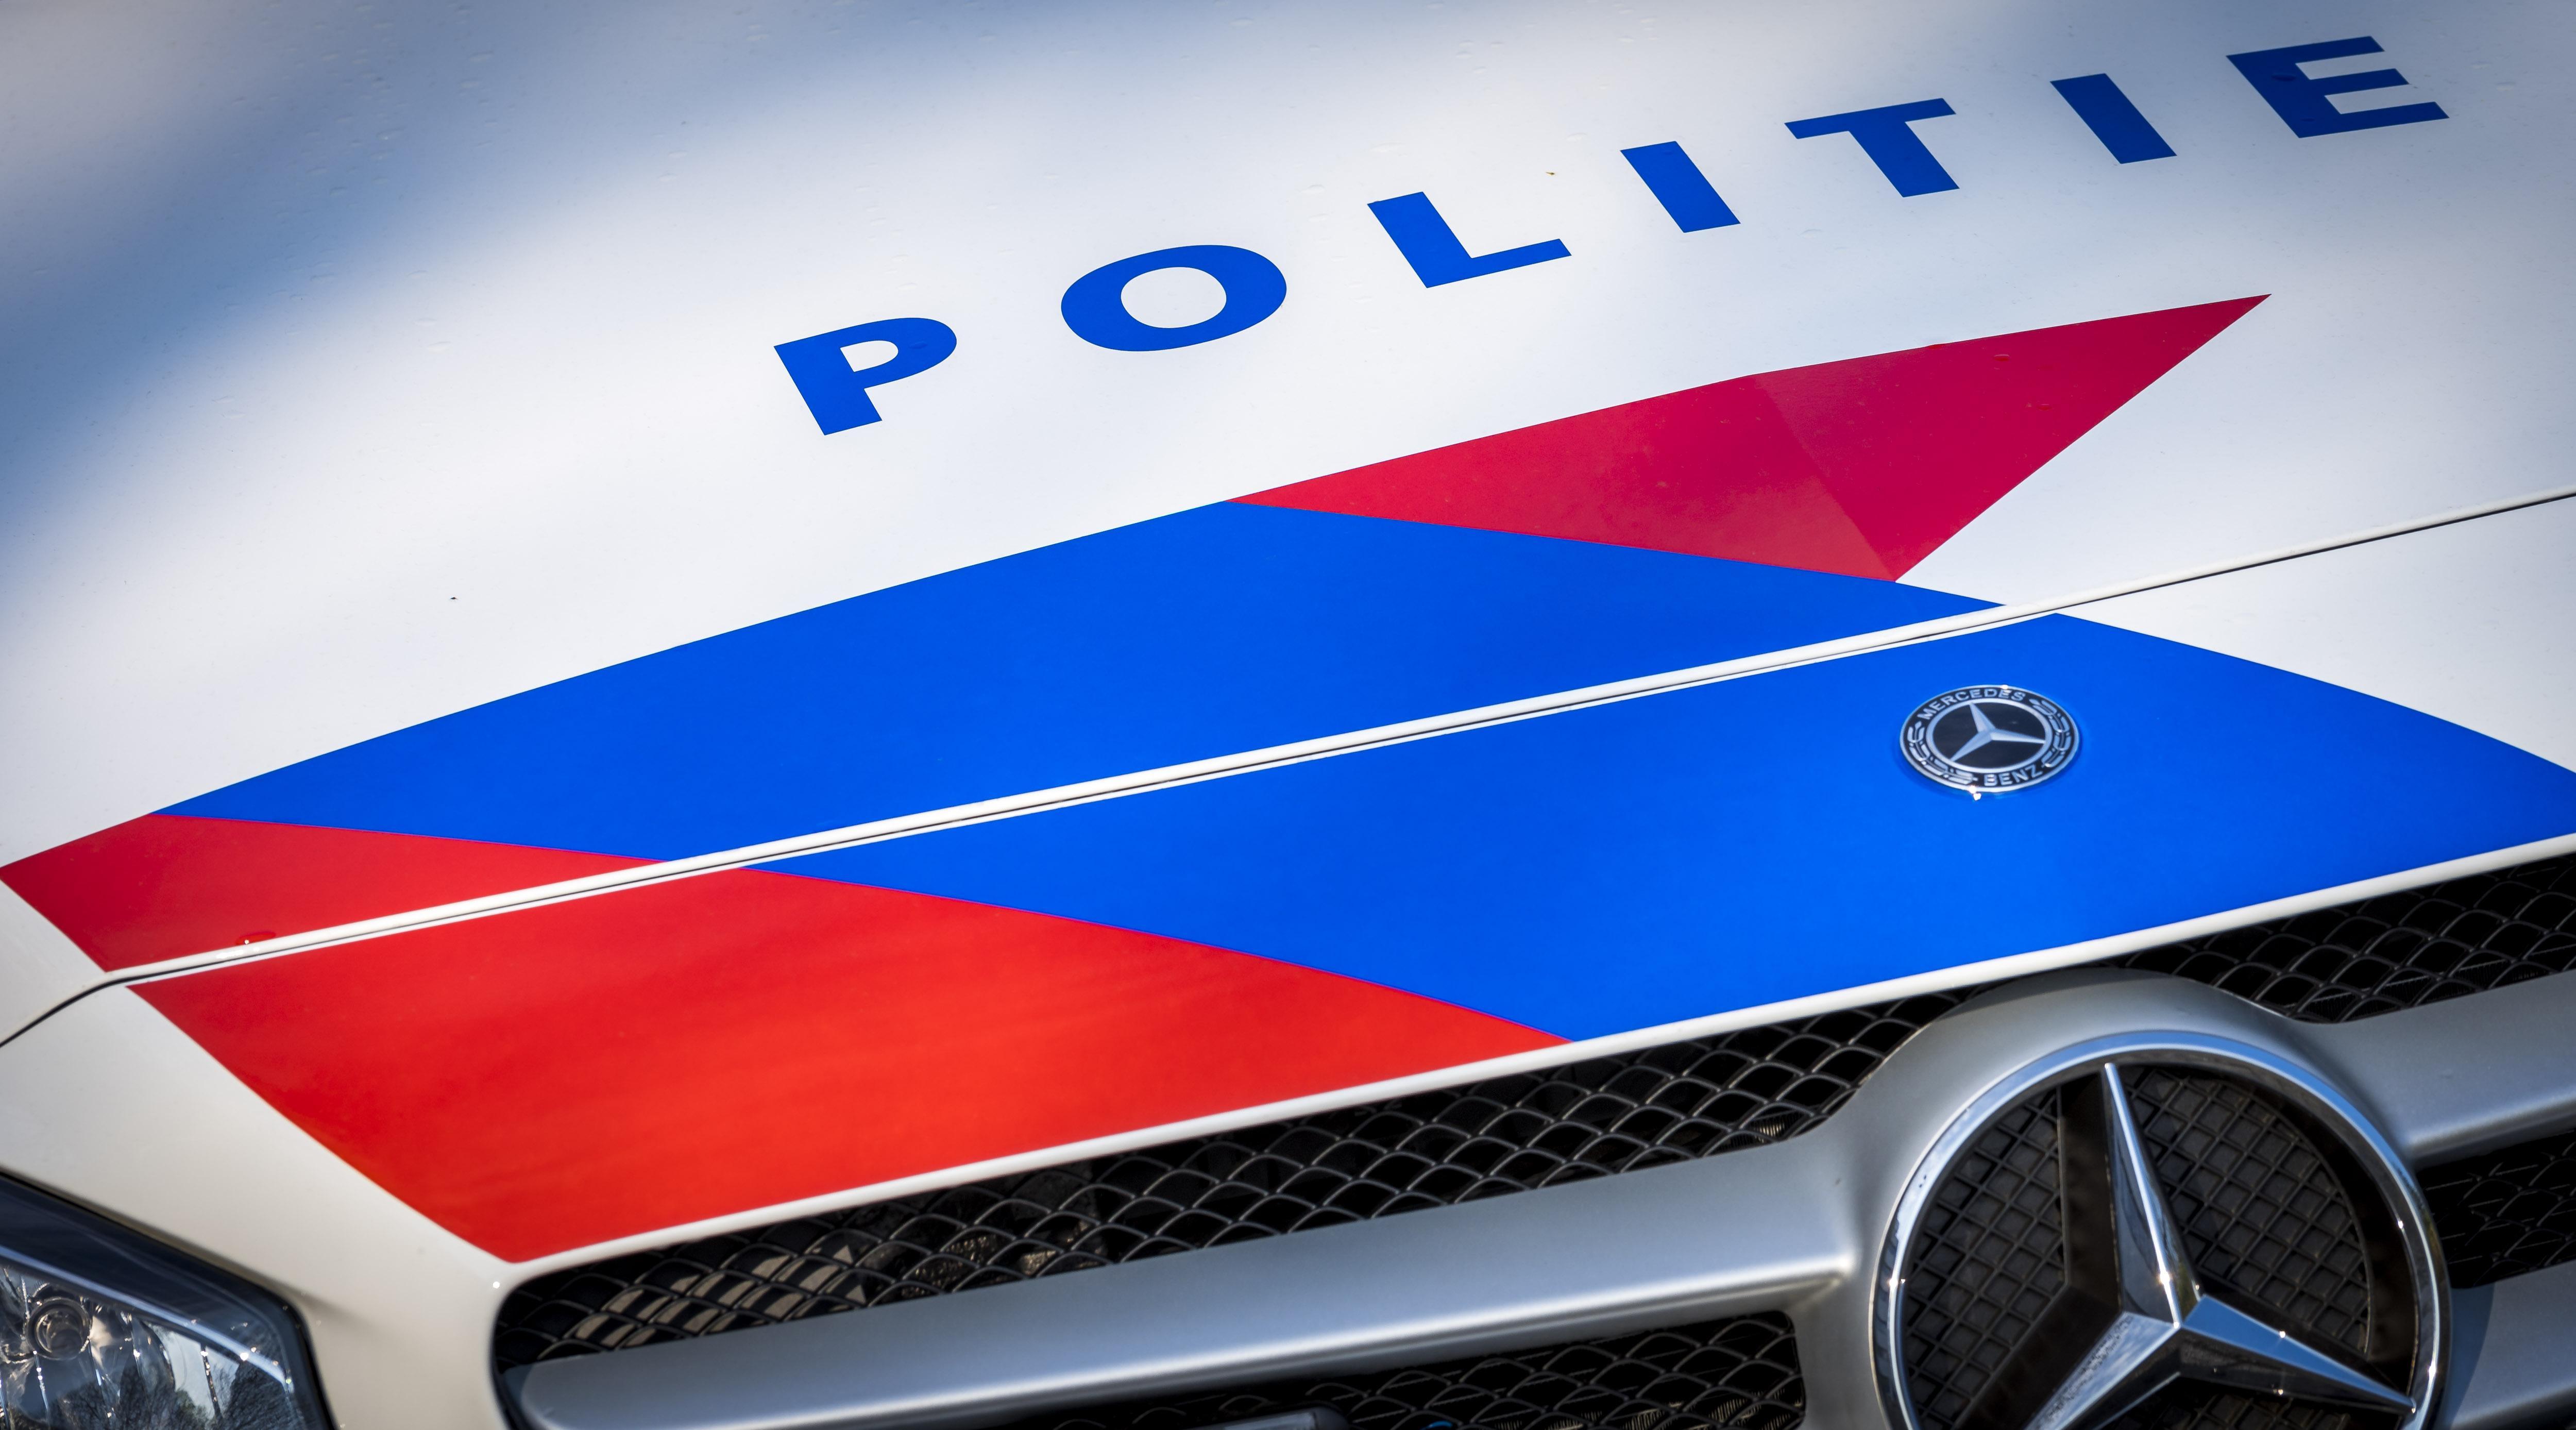 Politie vindt 485 kilo wiet en hasj in woning in Hilversum